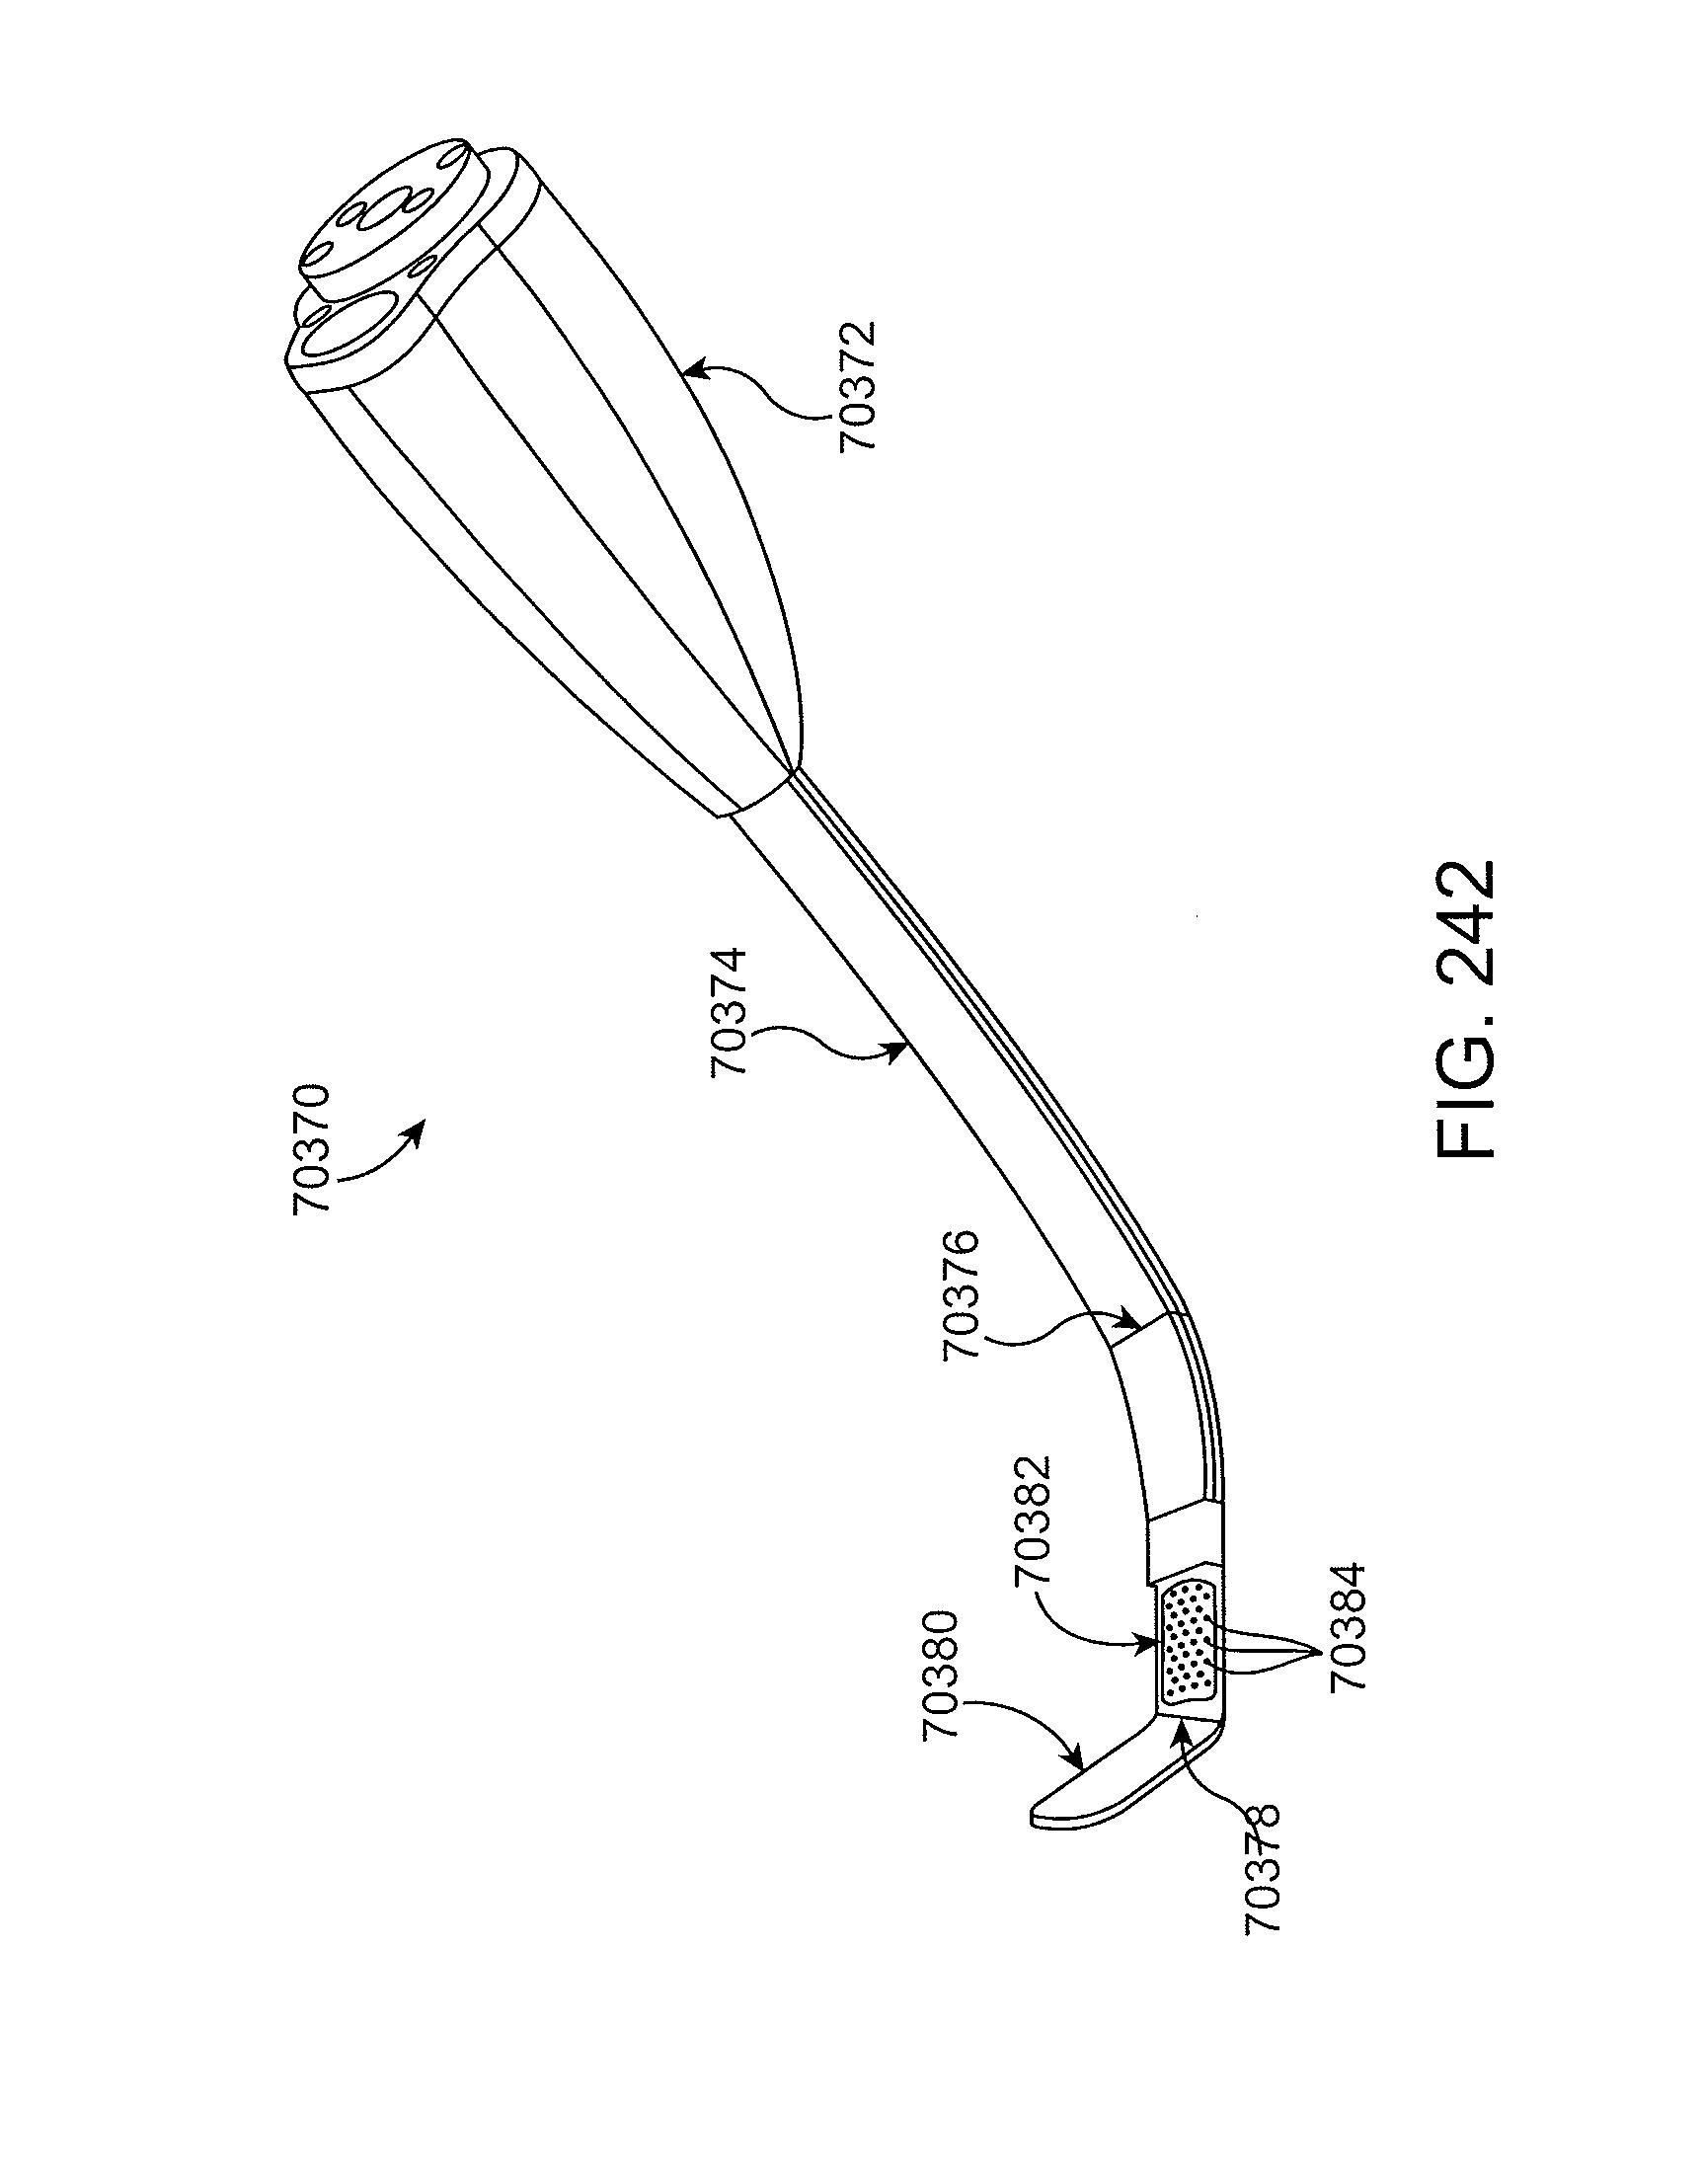 patent us 9 320 618 b2  patent images